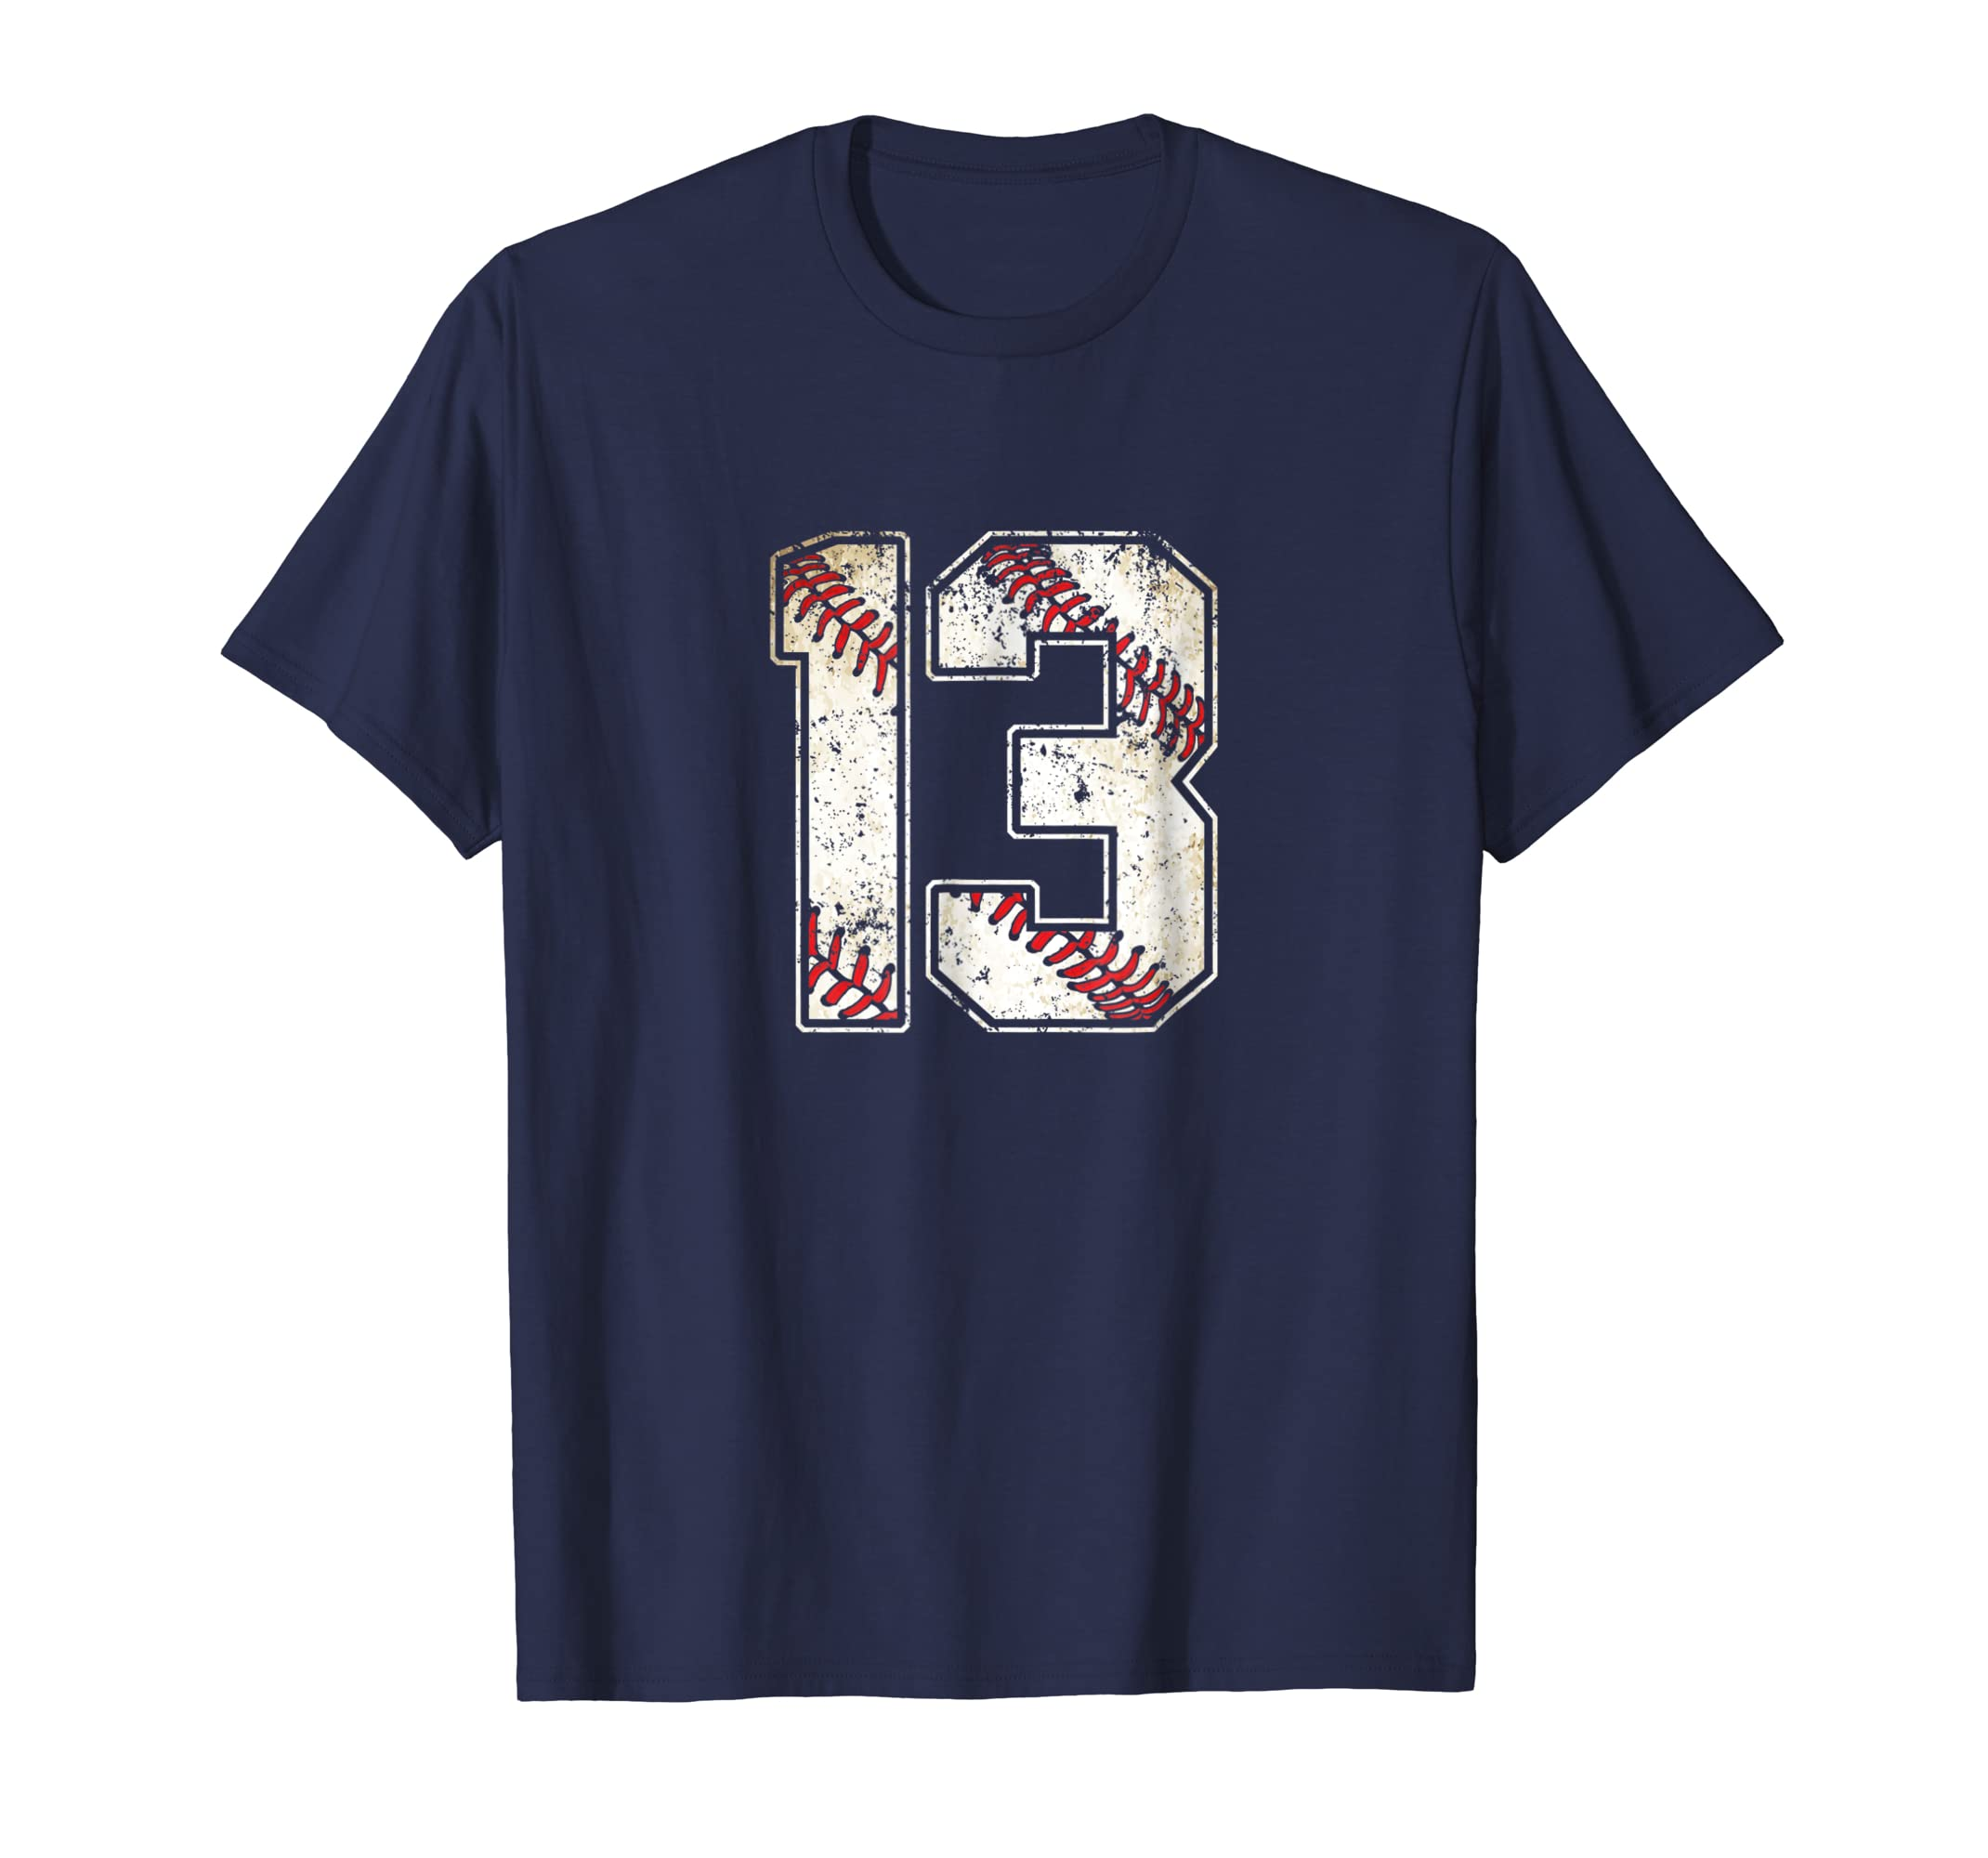 #13 Baseball Jersey Number 13 Retro Vintage T Shirt-ln